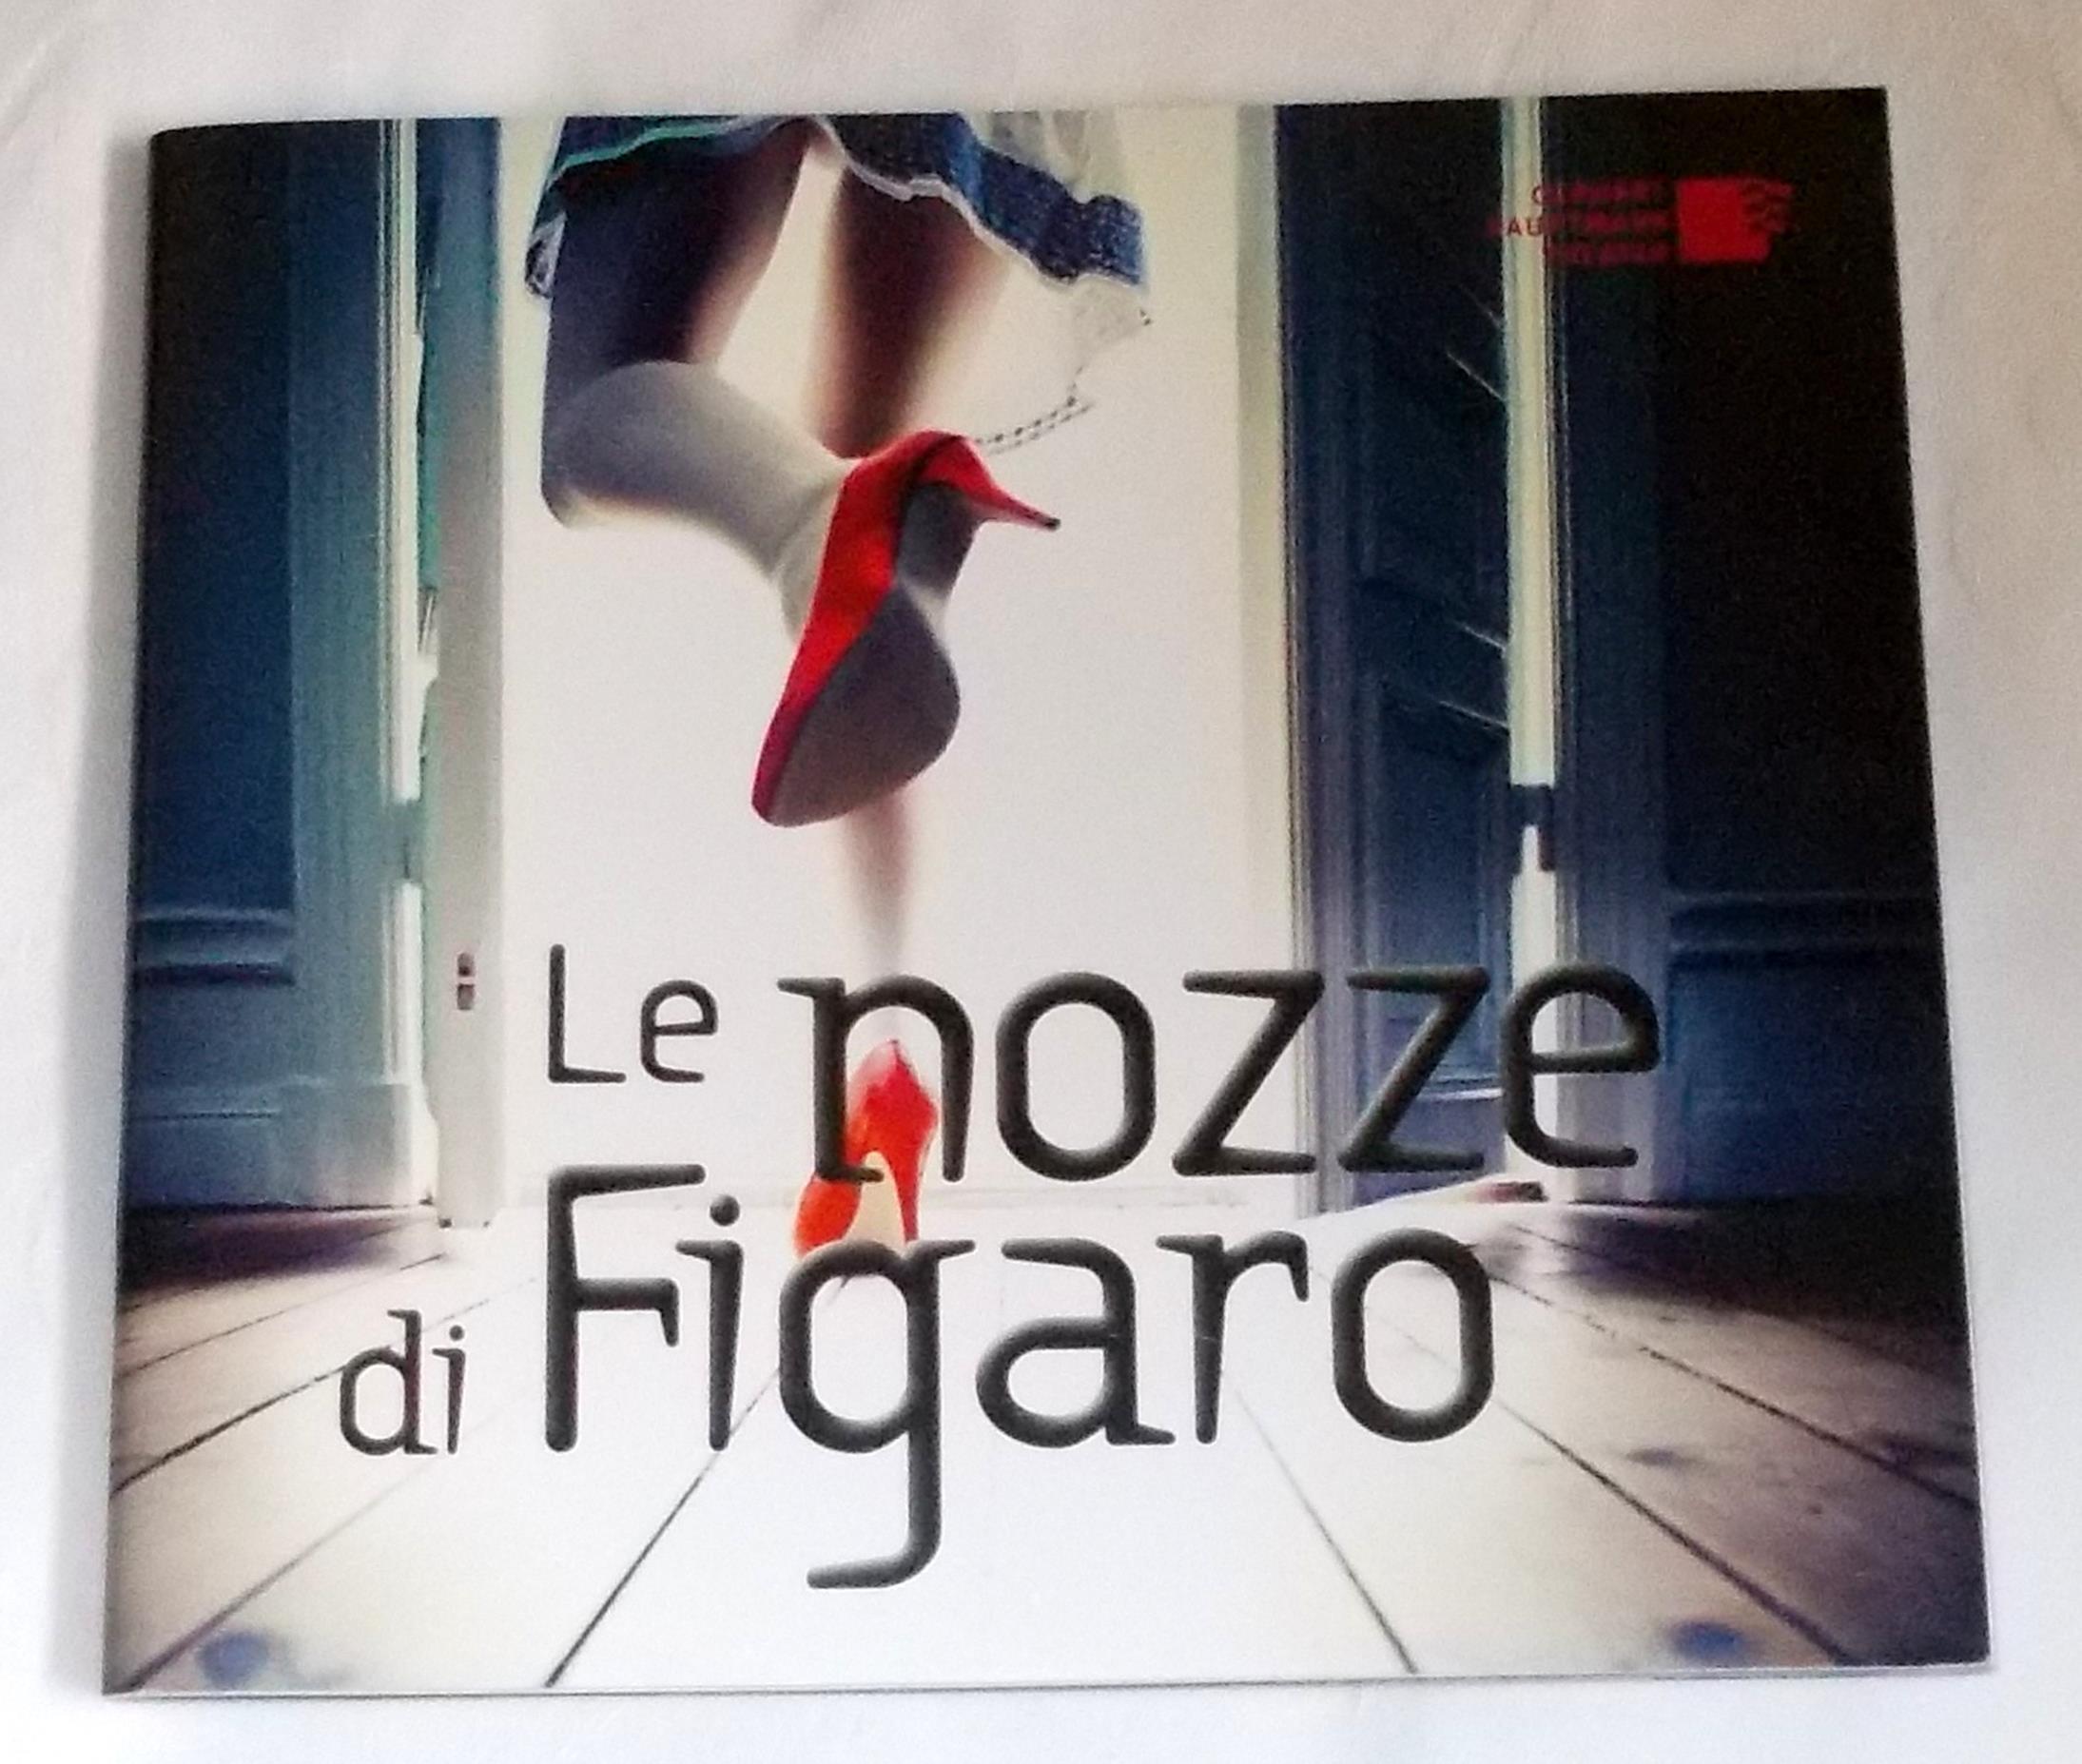 Programmheft Le nozze di Figaro. Gerhart Hauptmann Theater, Görlitz-Zittau 2013